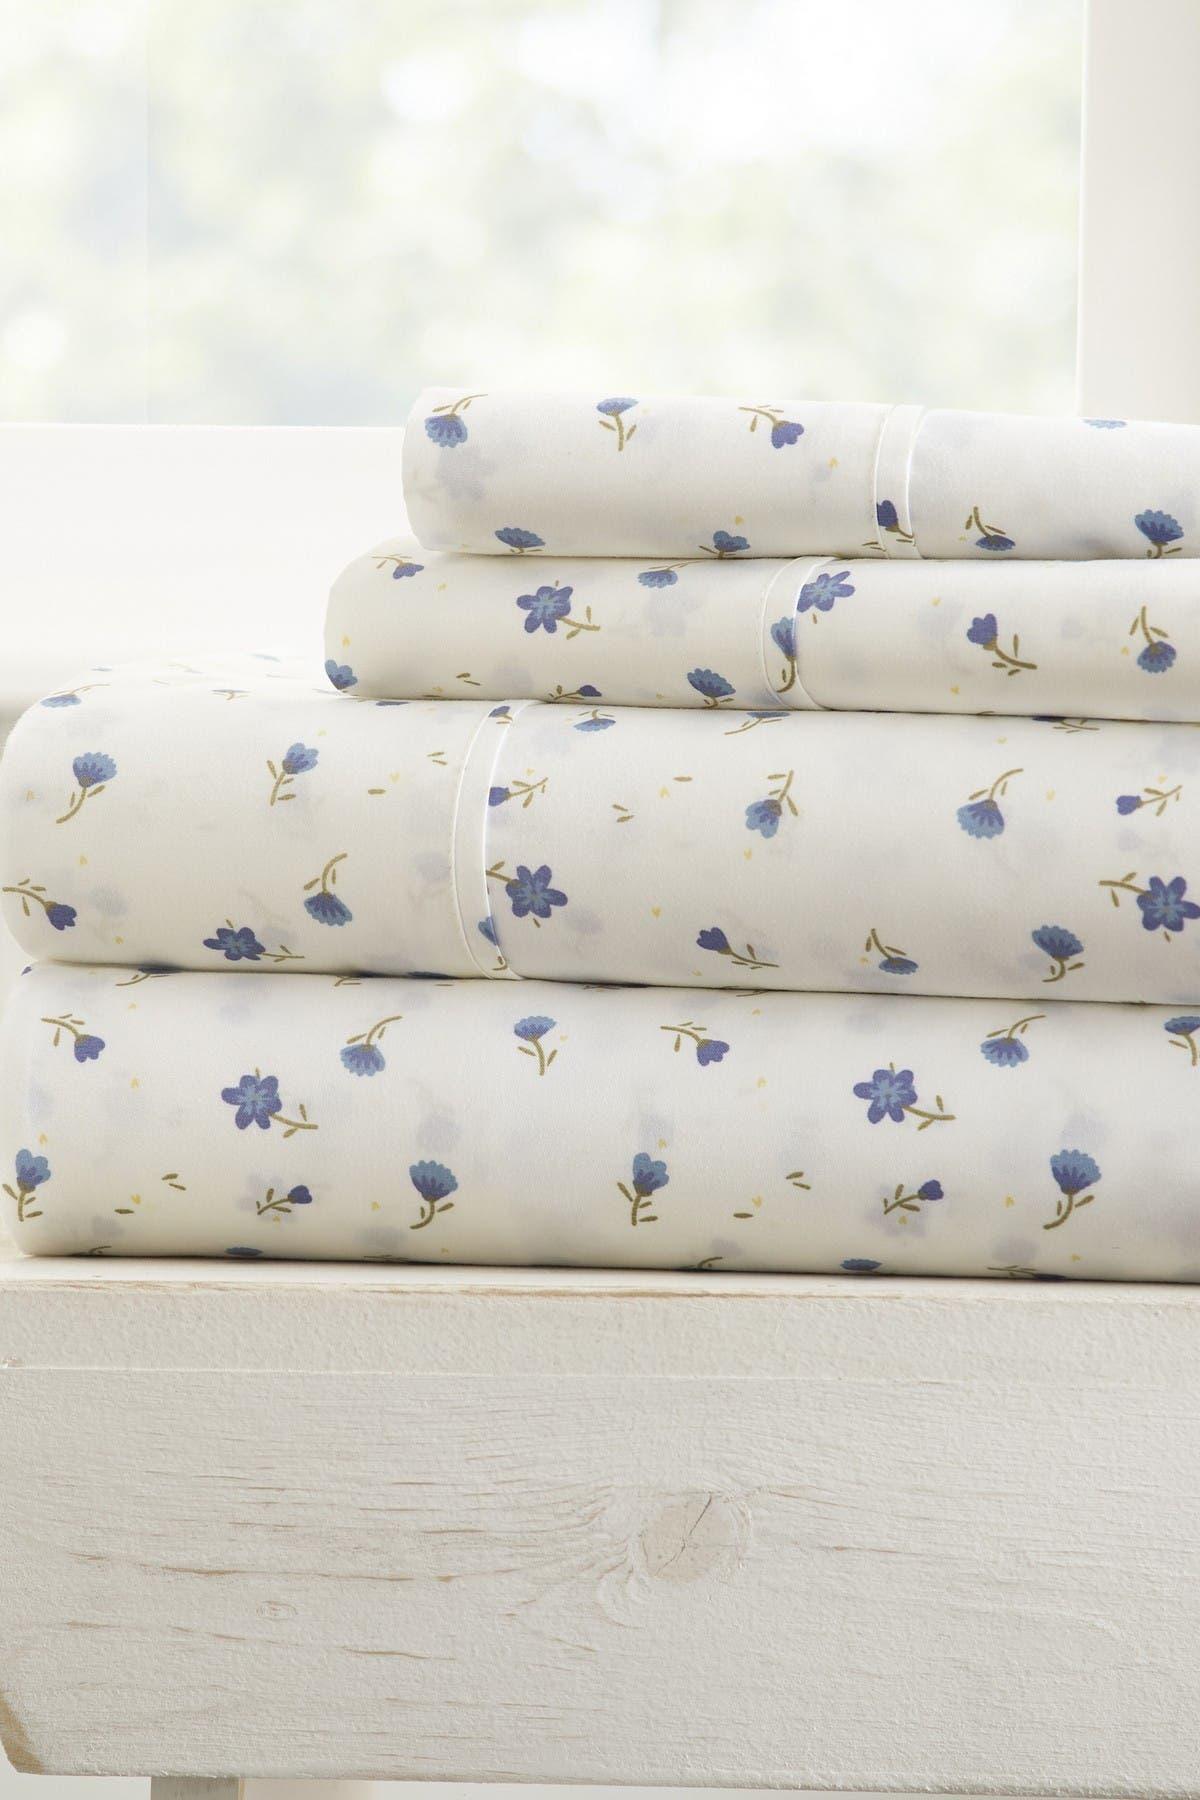 IENJOY HOME Home Spun Premium Ultra Soft Floral Pattern 4-Piece California King Bed Sheet Set - Light Blue at Nordstrom Rack